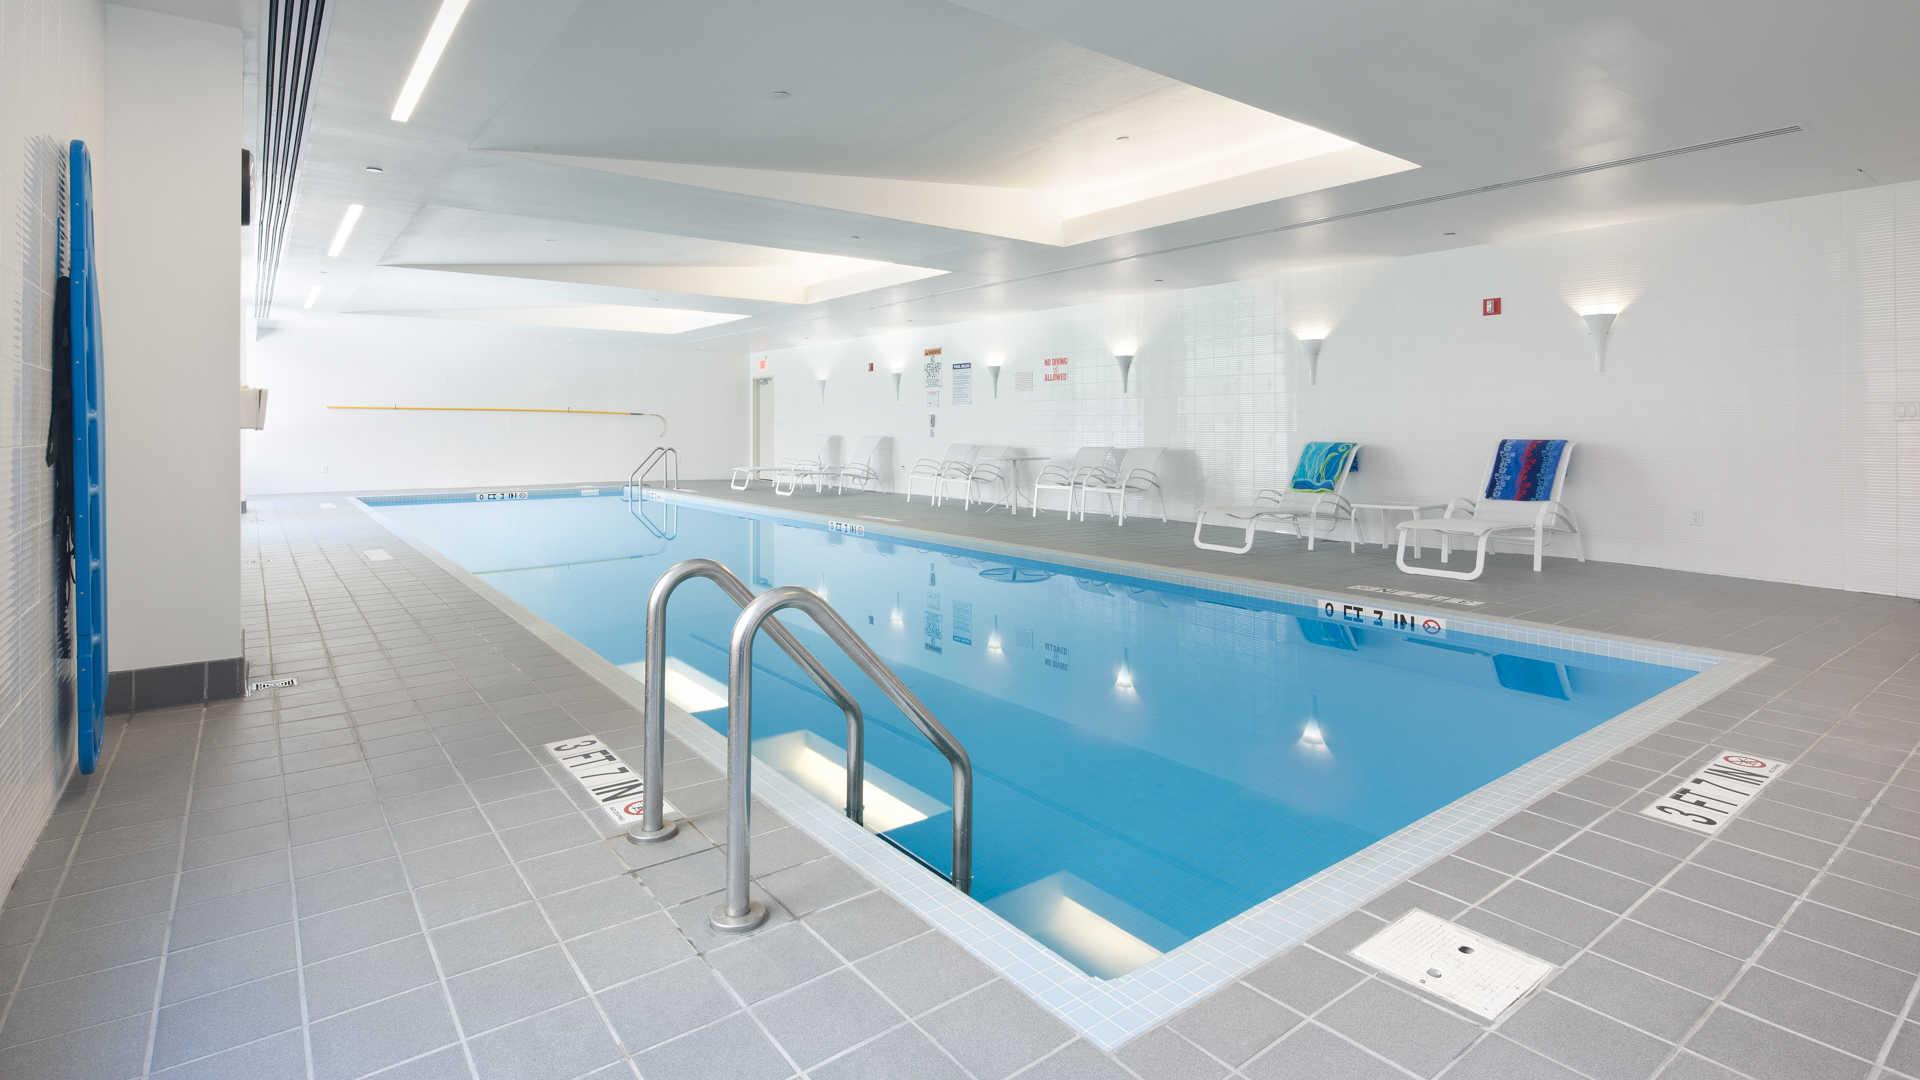 Third square apartments swimming pool